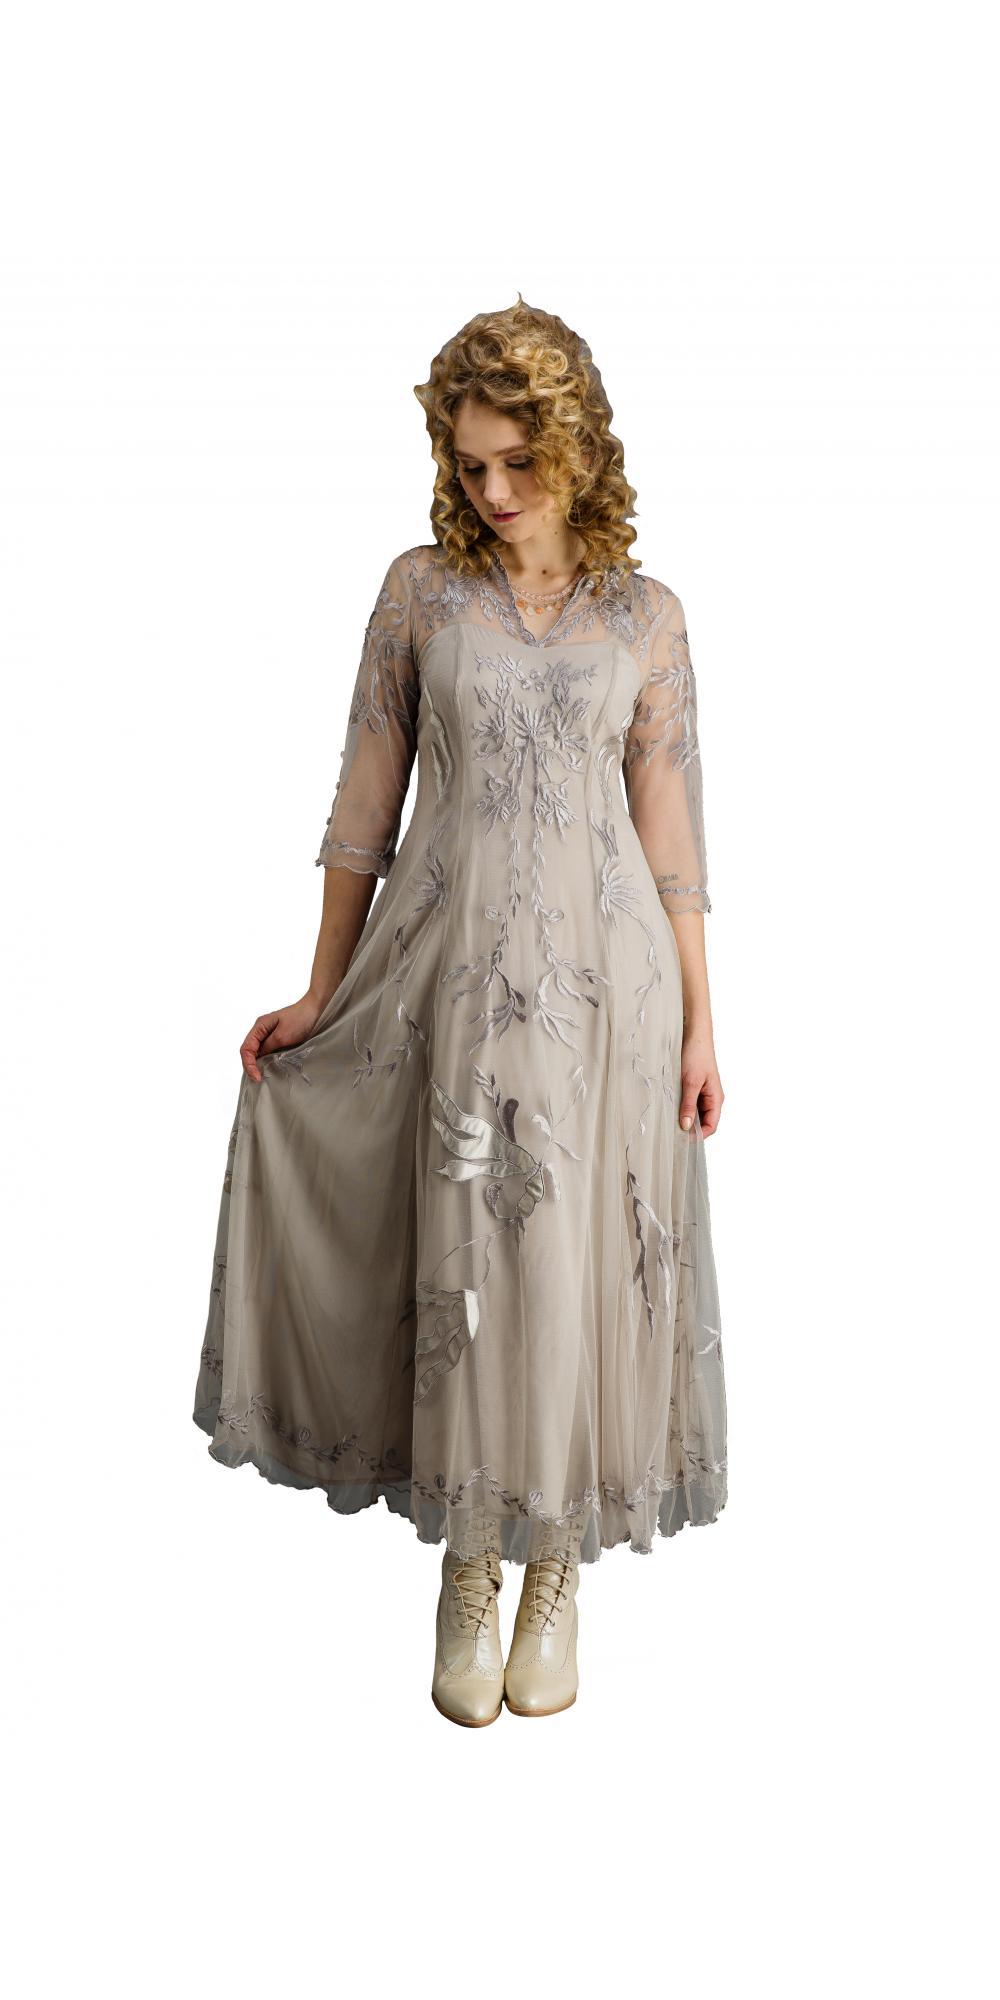 True Romance Nataya CL-2149 Vintage Style Wedding Dress in Silver/Grey